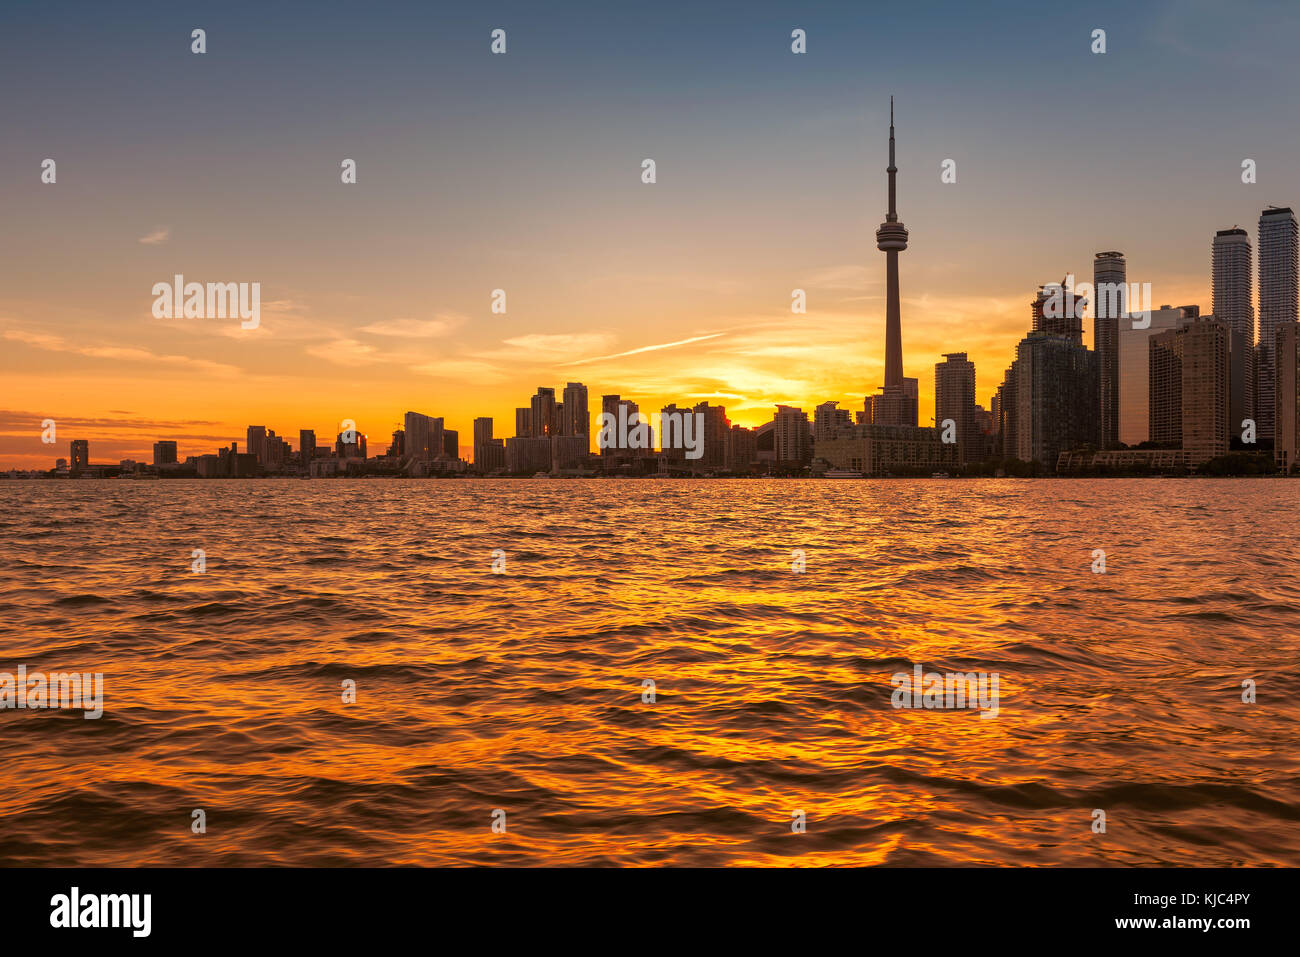 Toronto city skyline at beautiful sunset, Ontario, Canada. - Stock Image